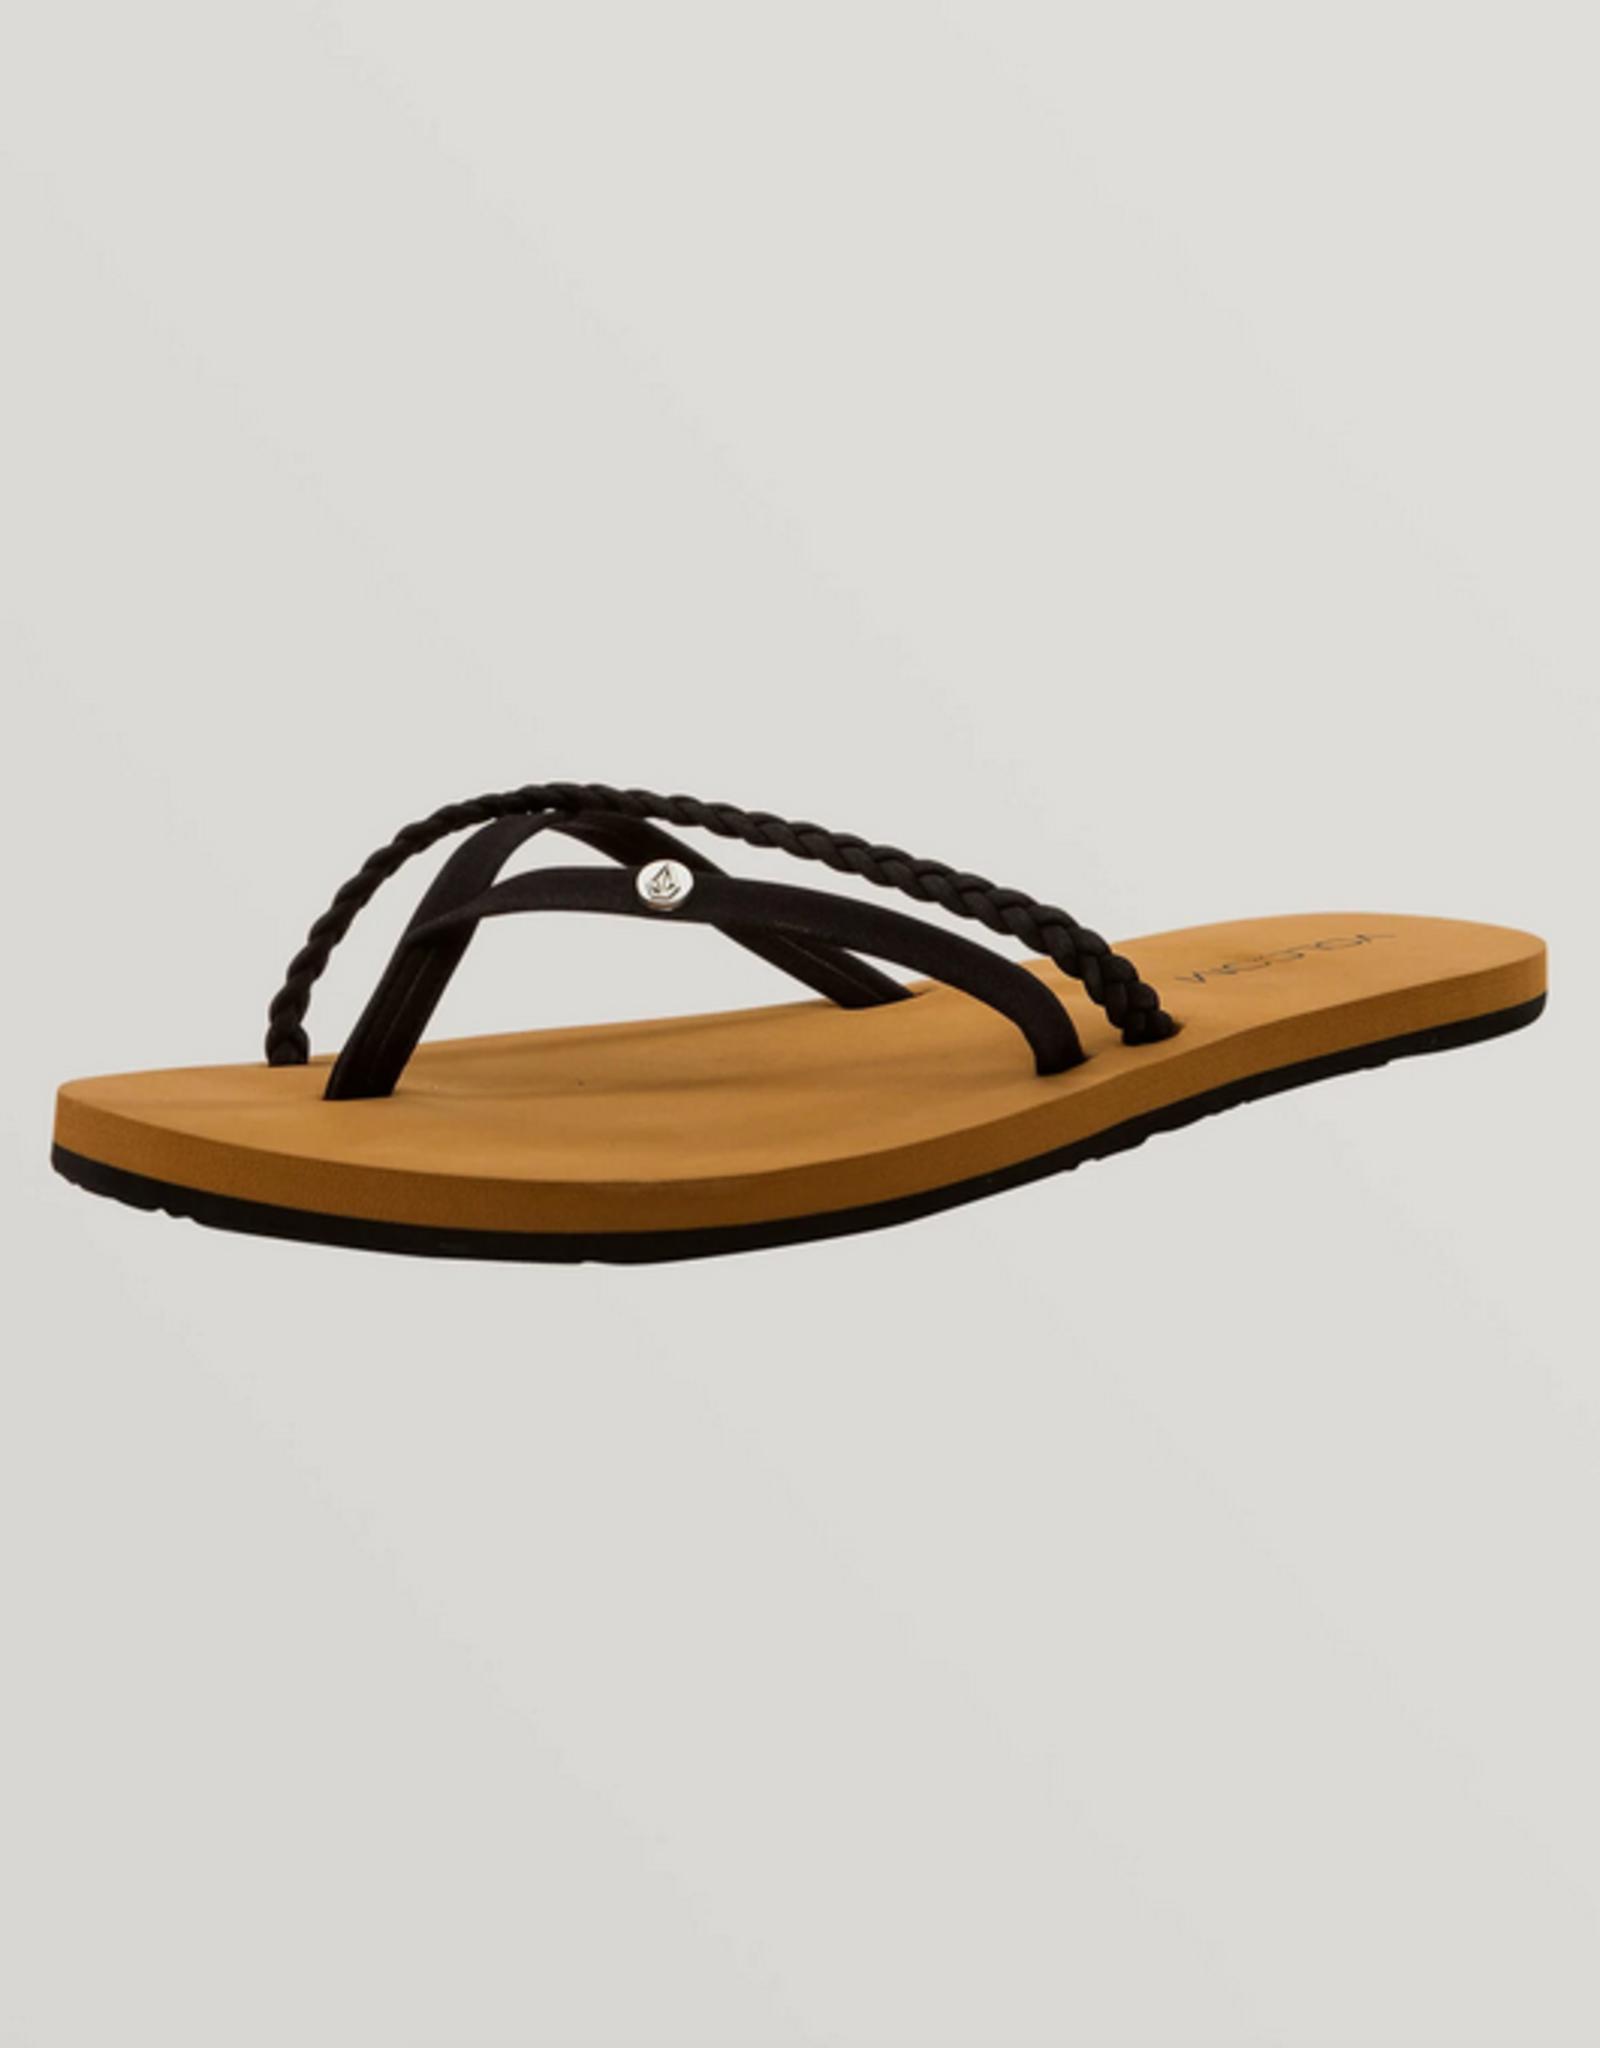 Volcom Thrills Sandal